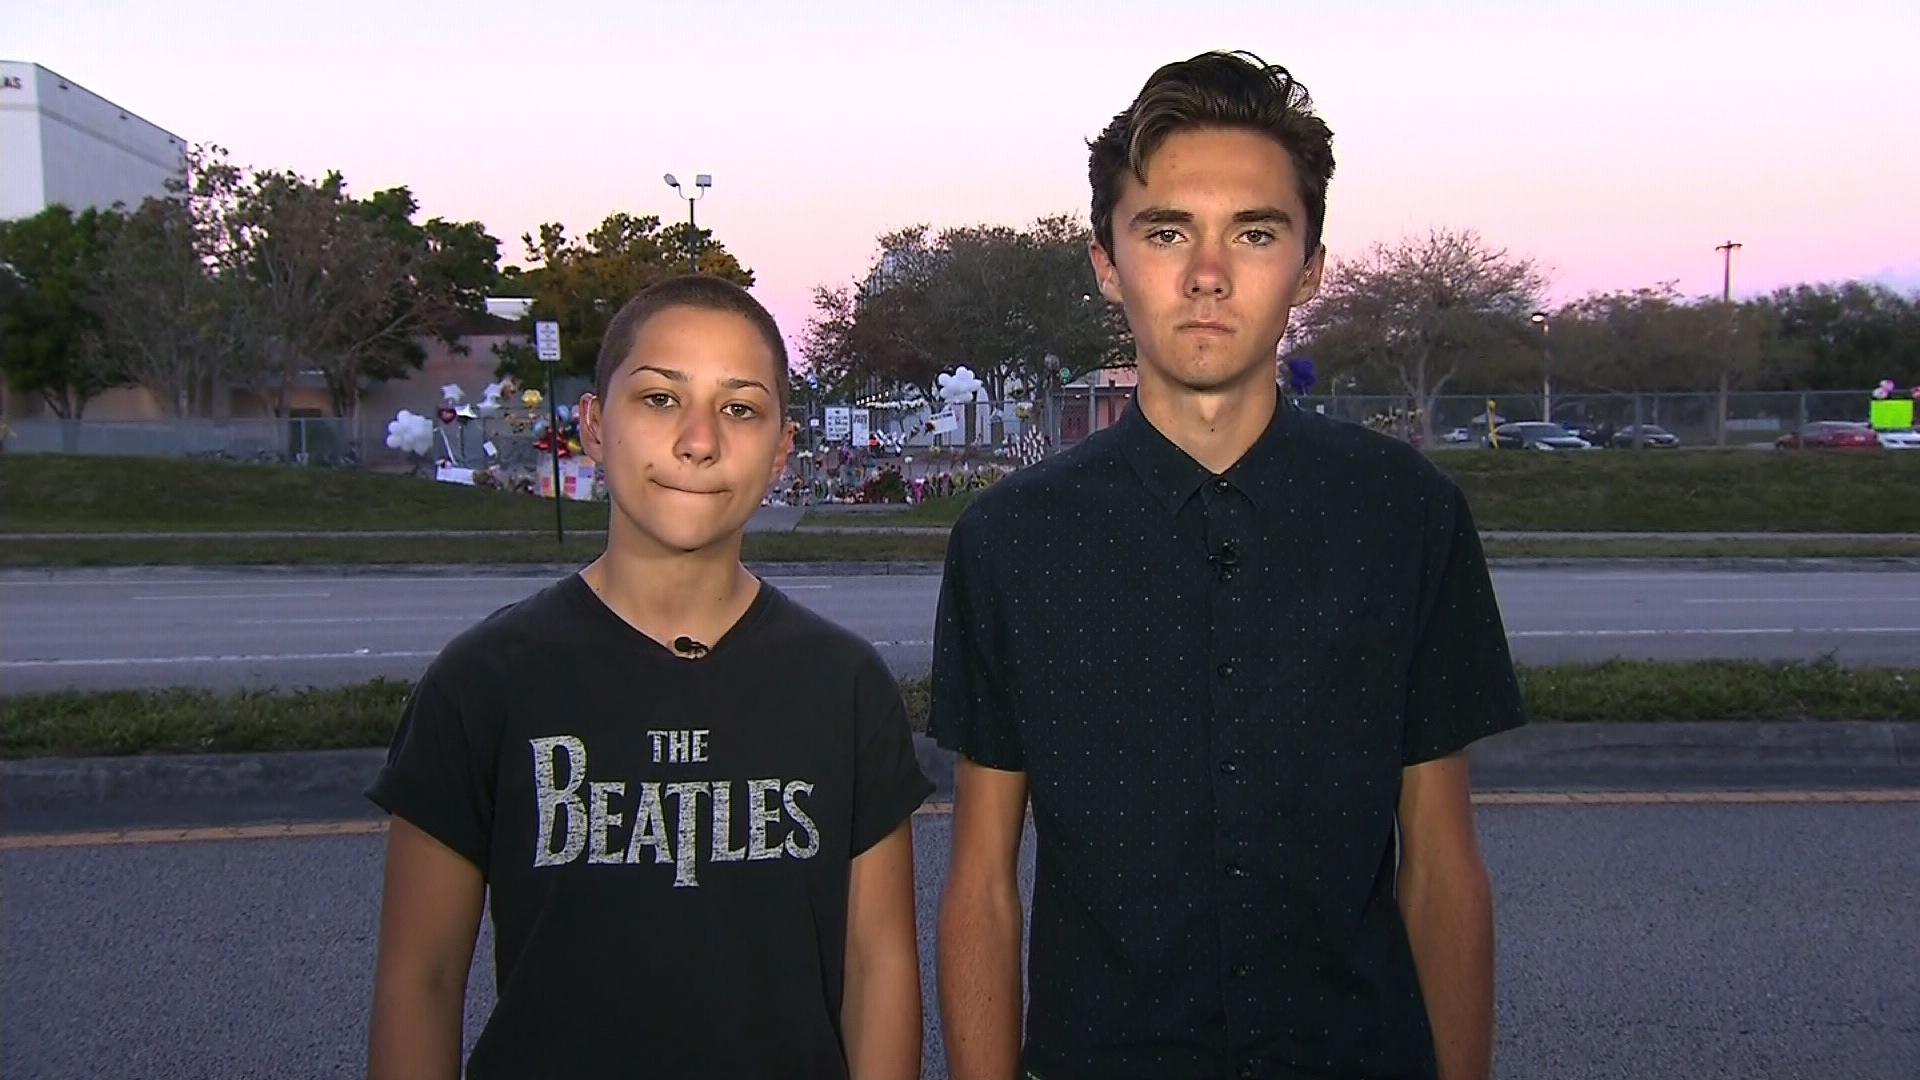 Emma Gonzalez and David Hogg, survivors of the shooting at Marjory Stonemason Douglas High School,